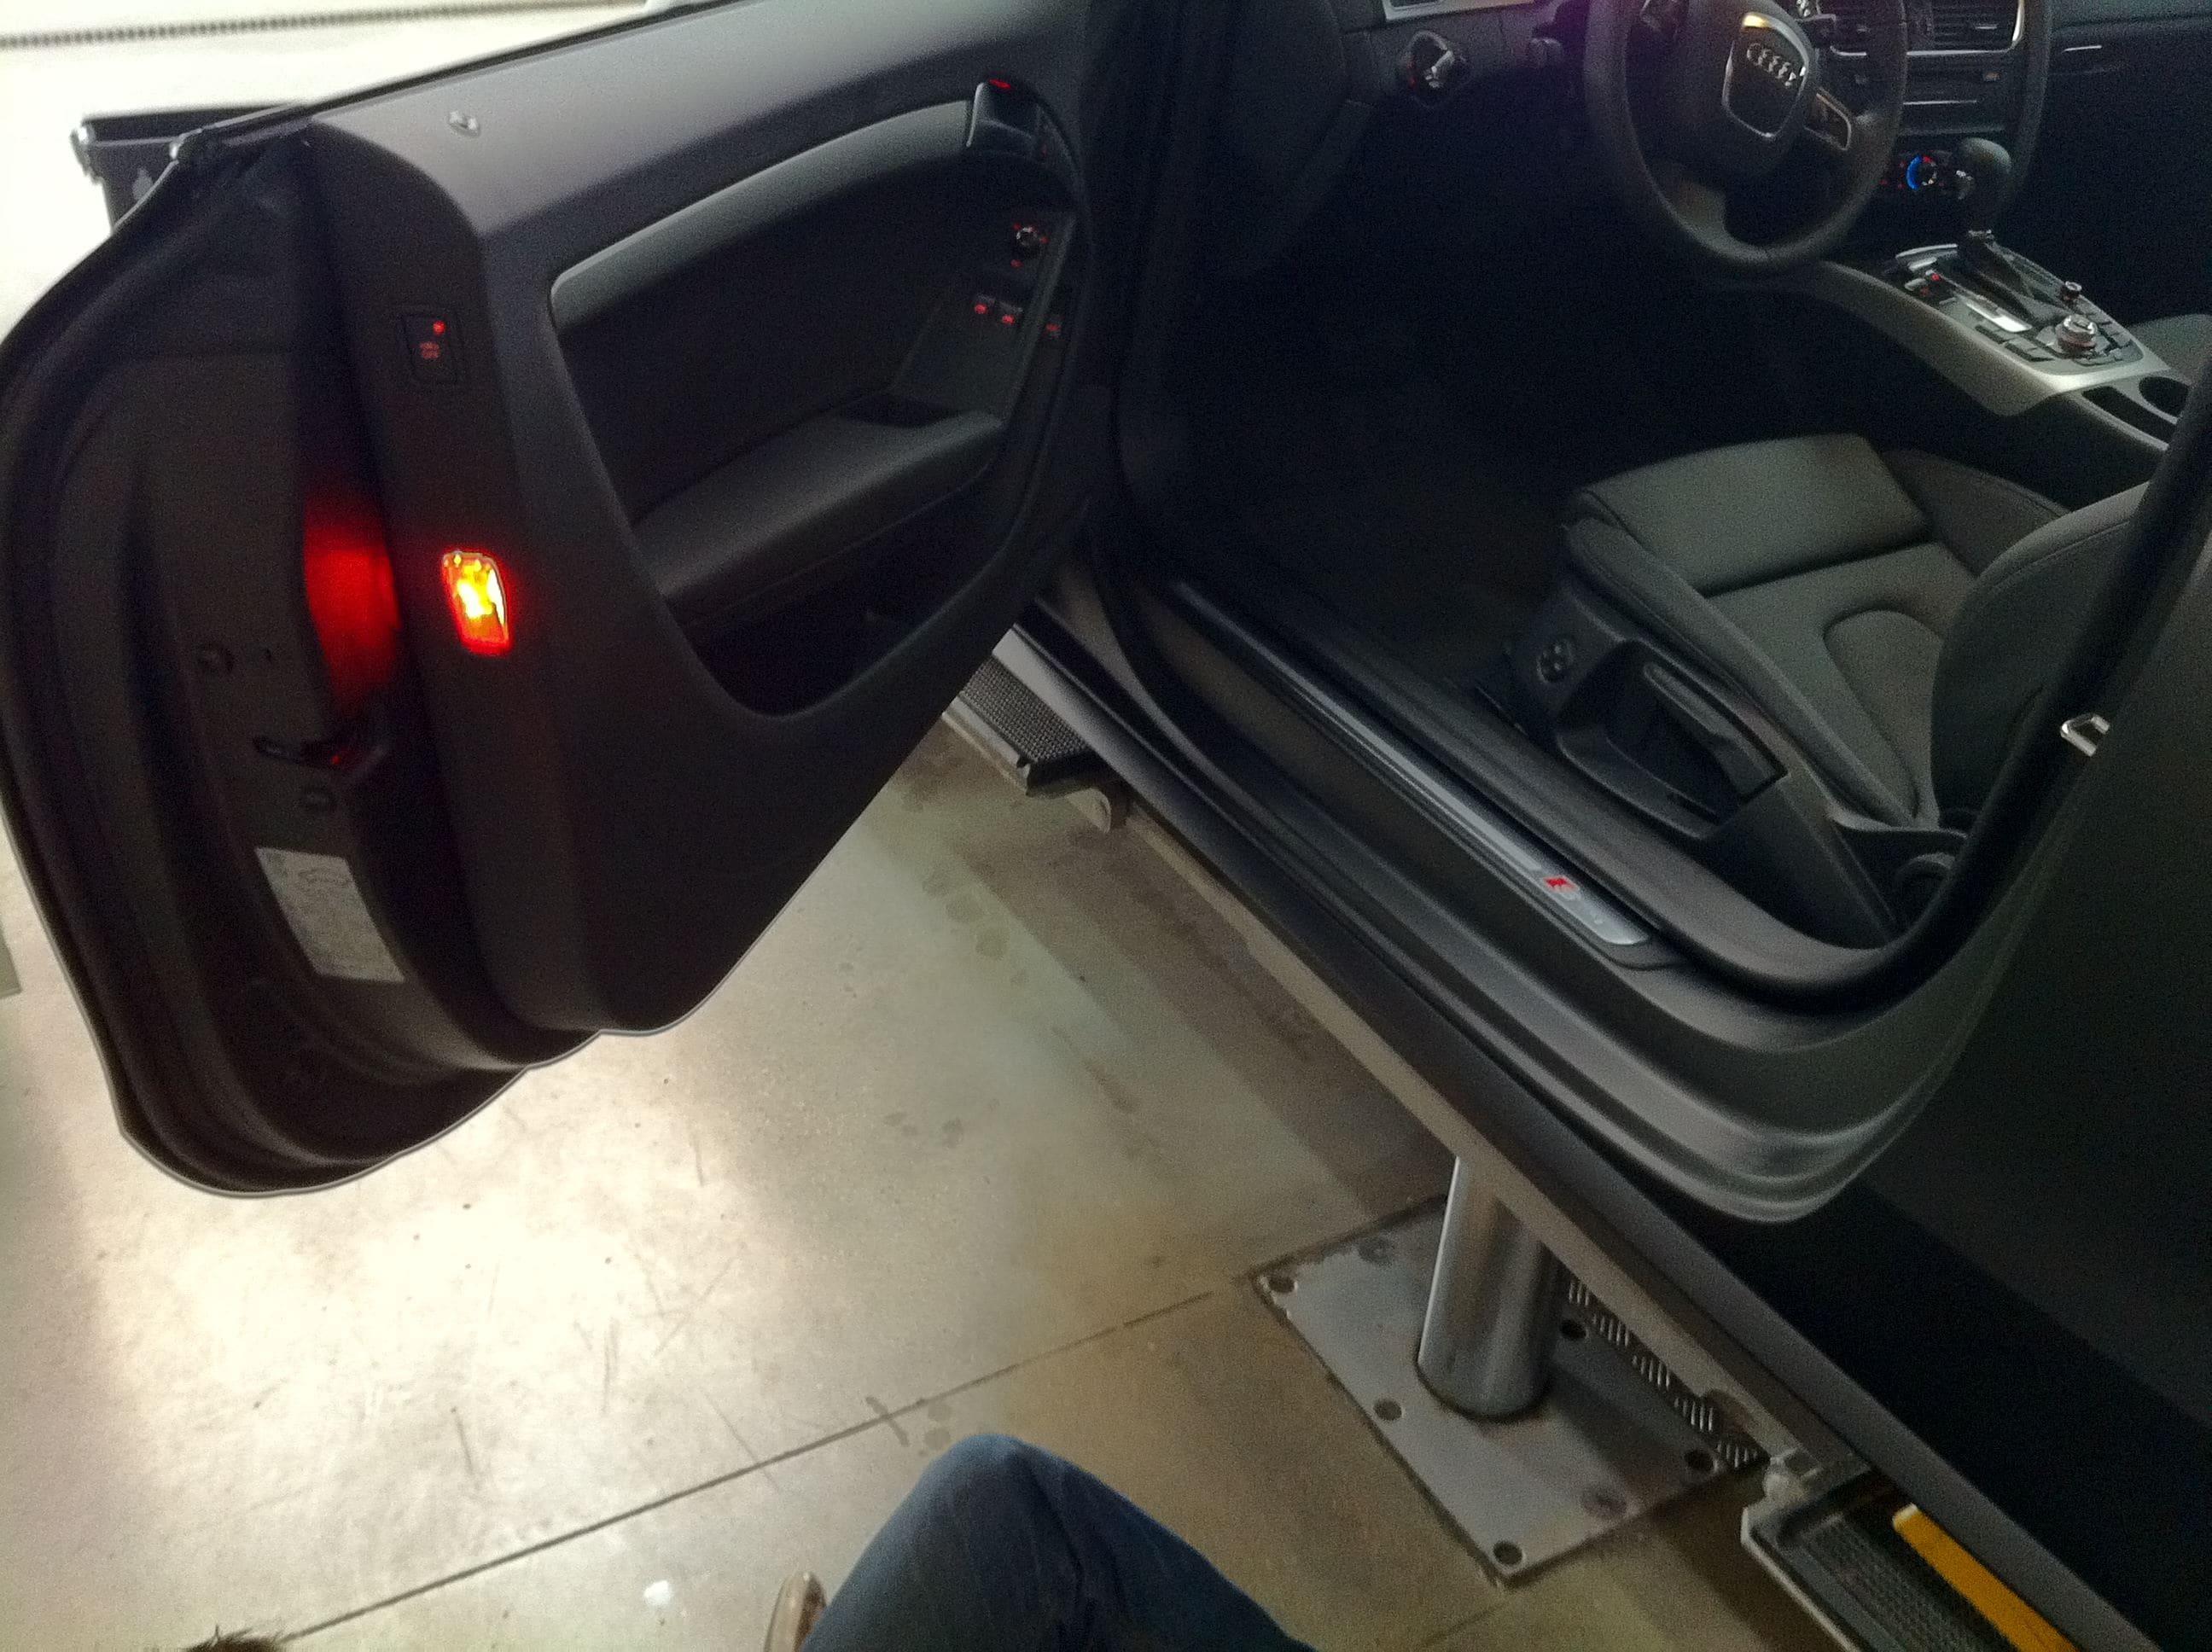 Audi A5 Coupe met Mat Zwarte Wrap, Carwrapping door Wrapmyride.nu Foto-nr:4593, ©2021